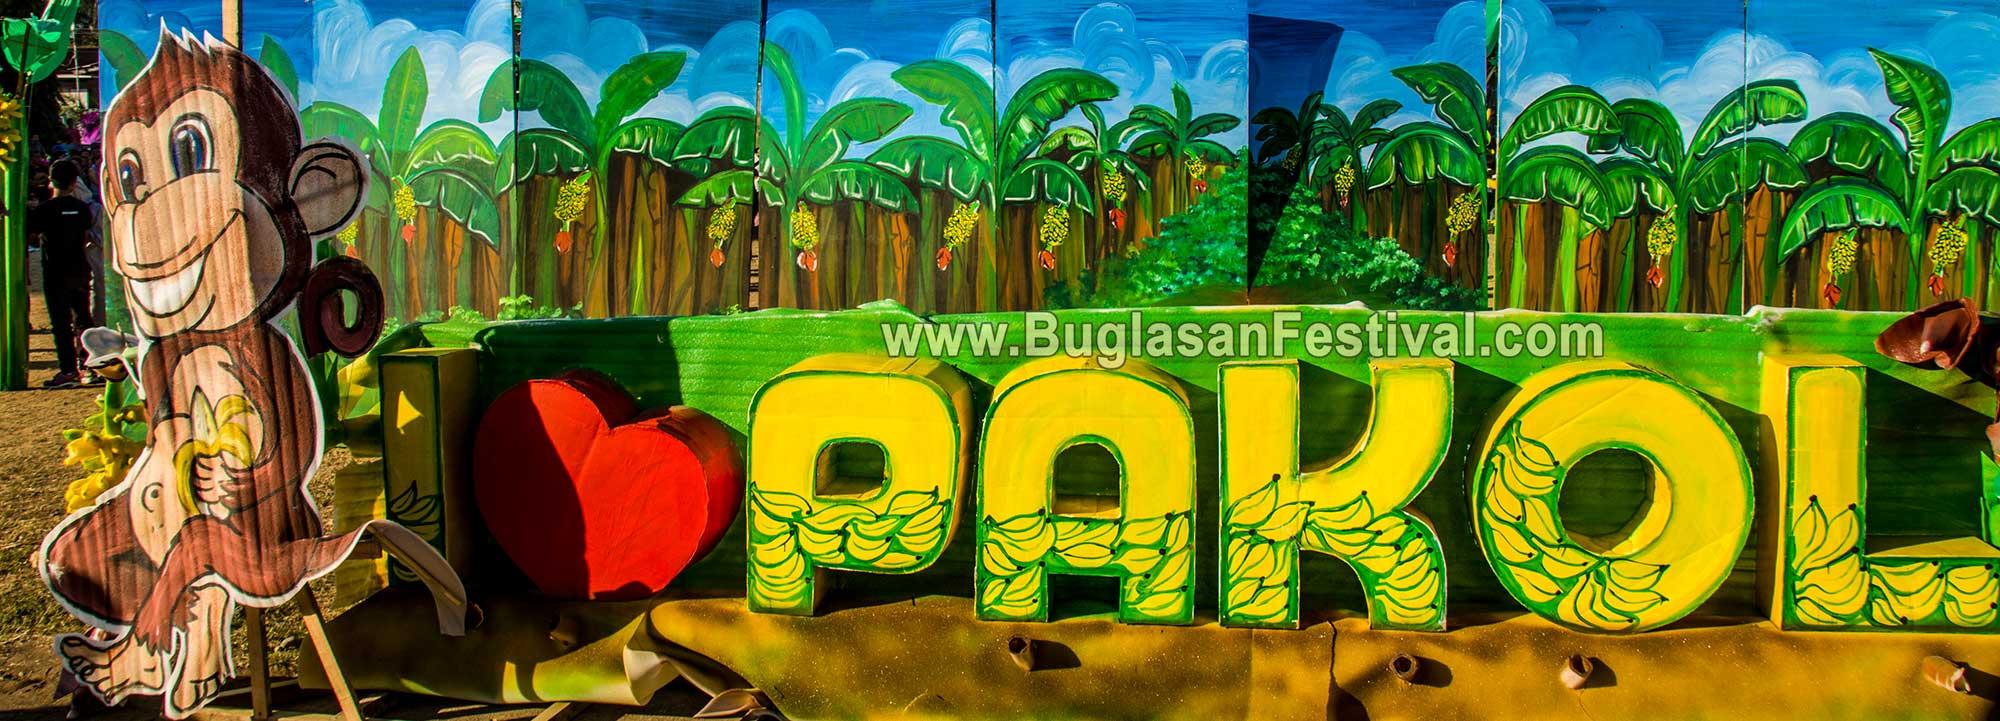 Pakol Festival 2018 - Santa Catalina - Negros Oriental